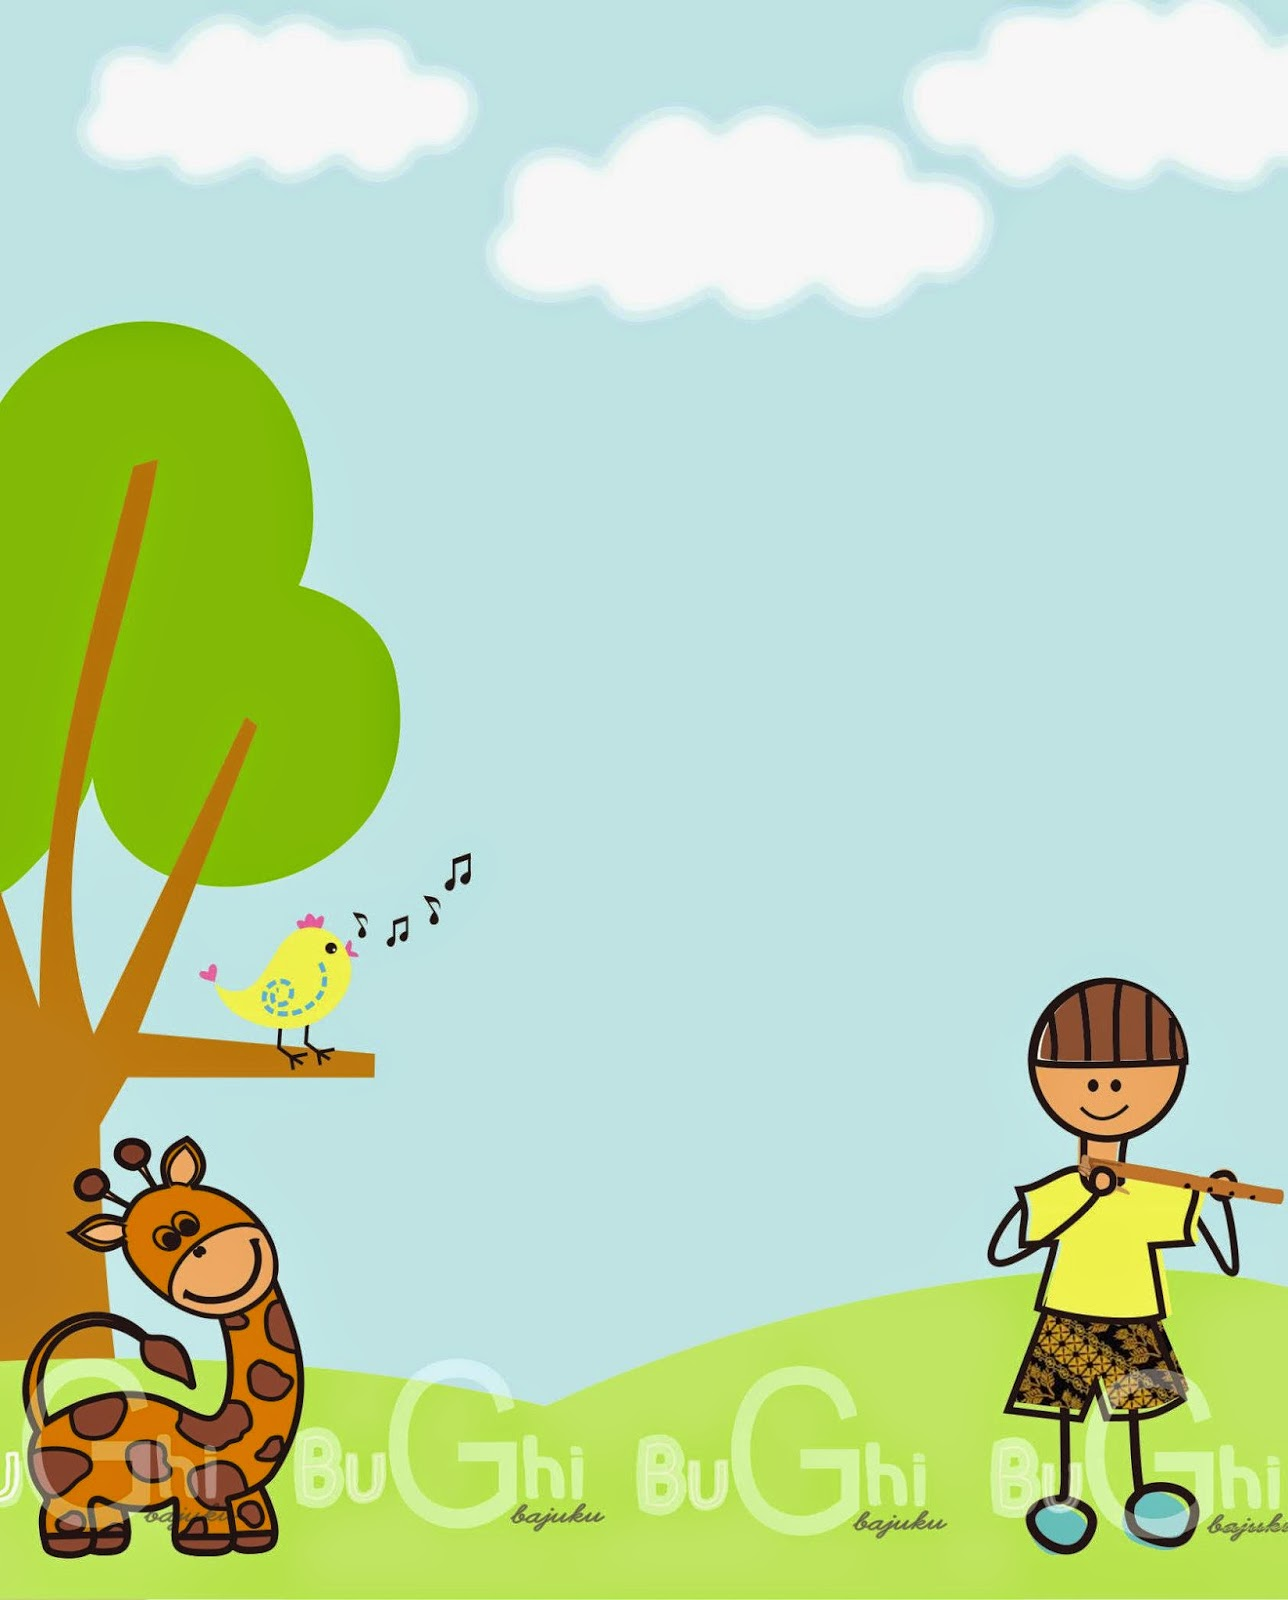 Gambar Background Untuk Anak Tk Foto Manasik Haji 25x3m Lucu Pro